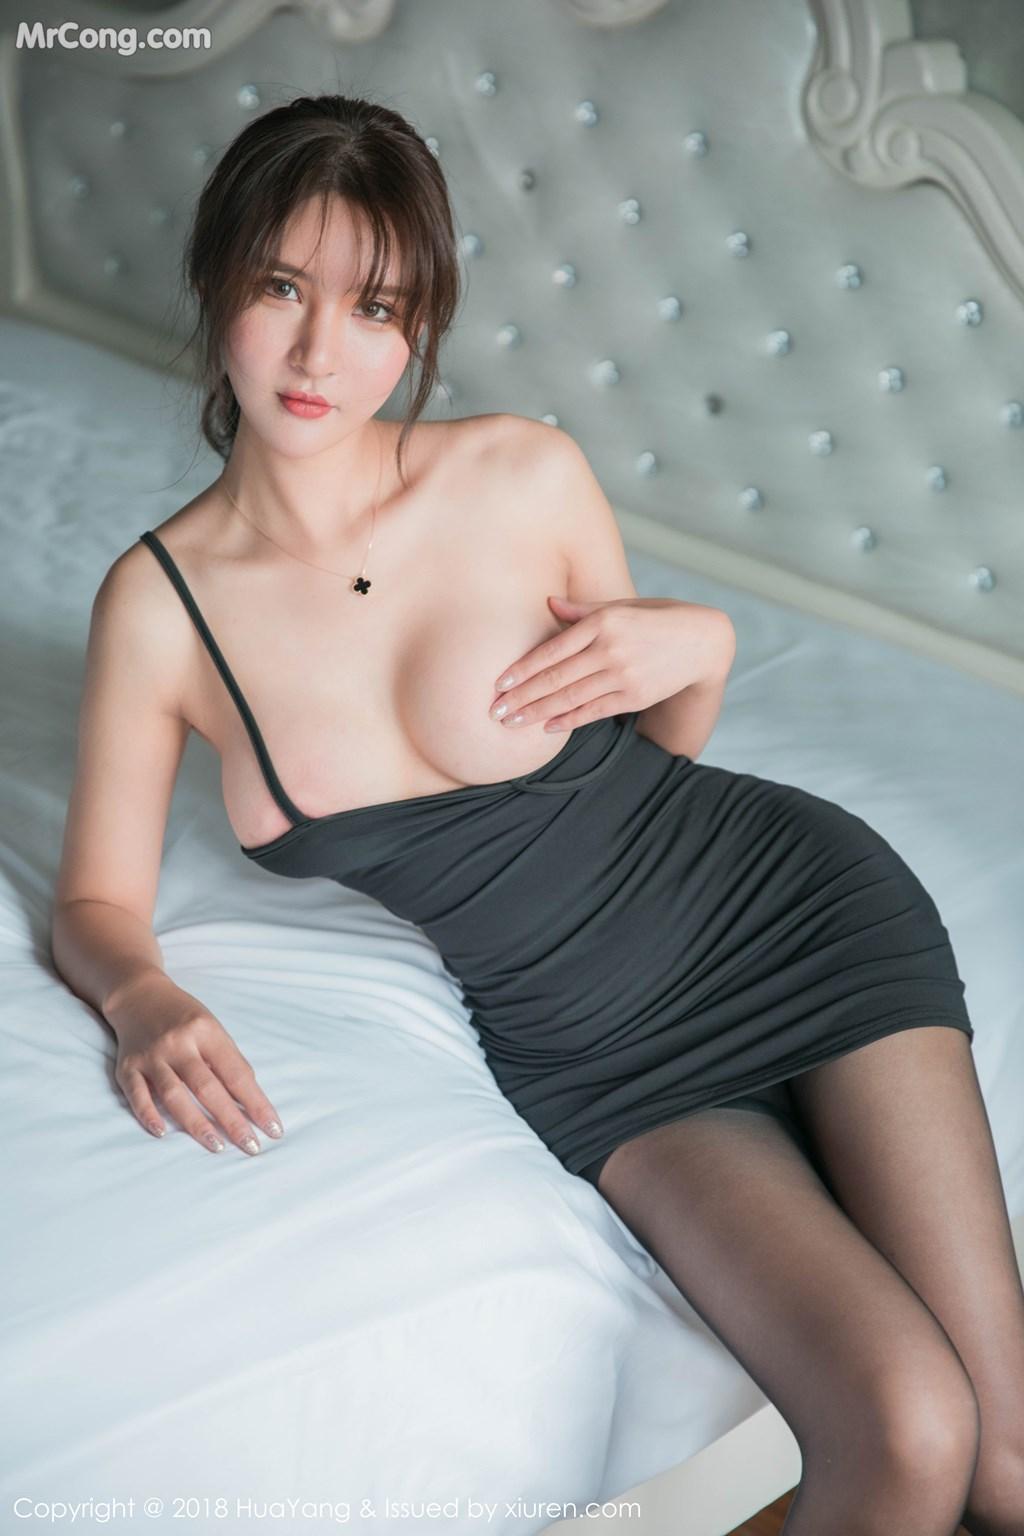 Image HuaYang-2018-11-14-Vol.095-SOLO-MrCong.com-012 in post HuaYang 2018-11-14 Vol.095: Người mẫu SOLO-尹菲 (46 ảnh)